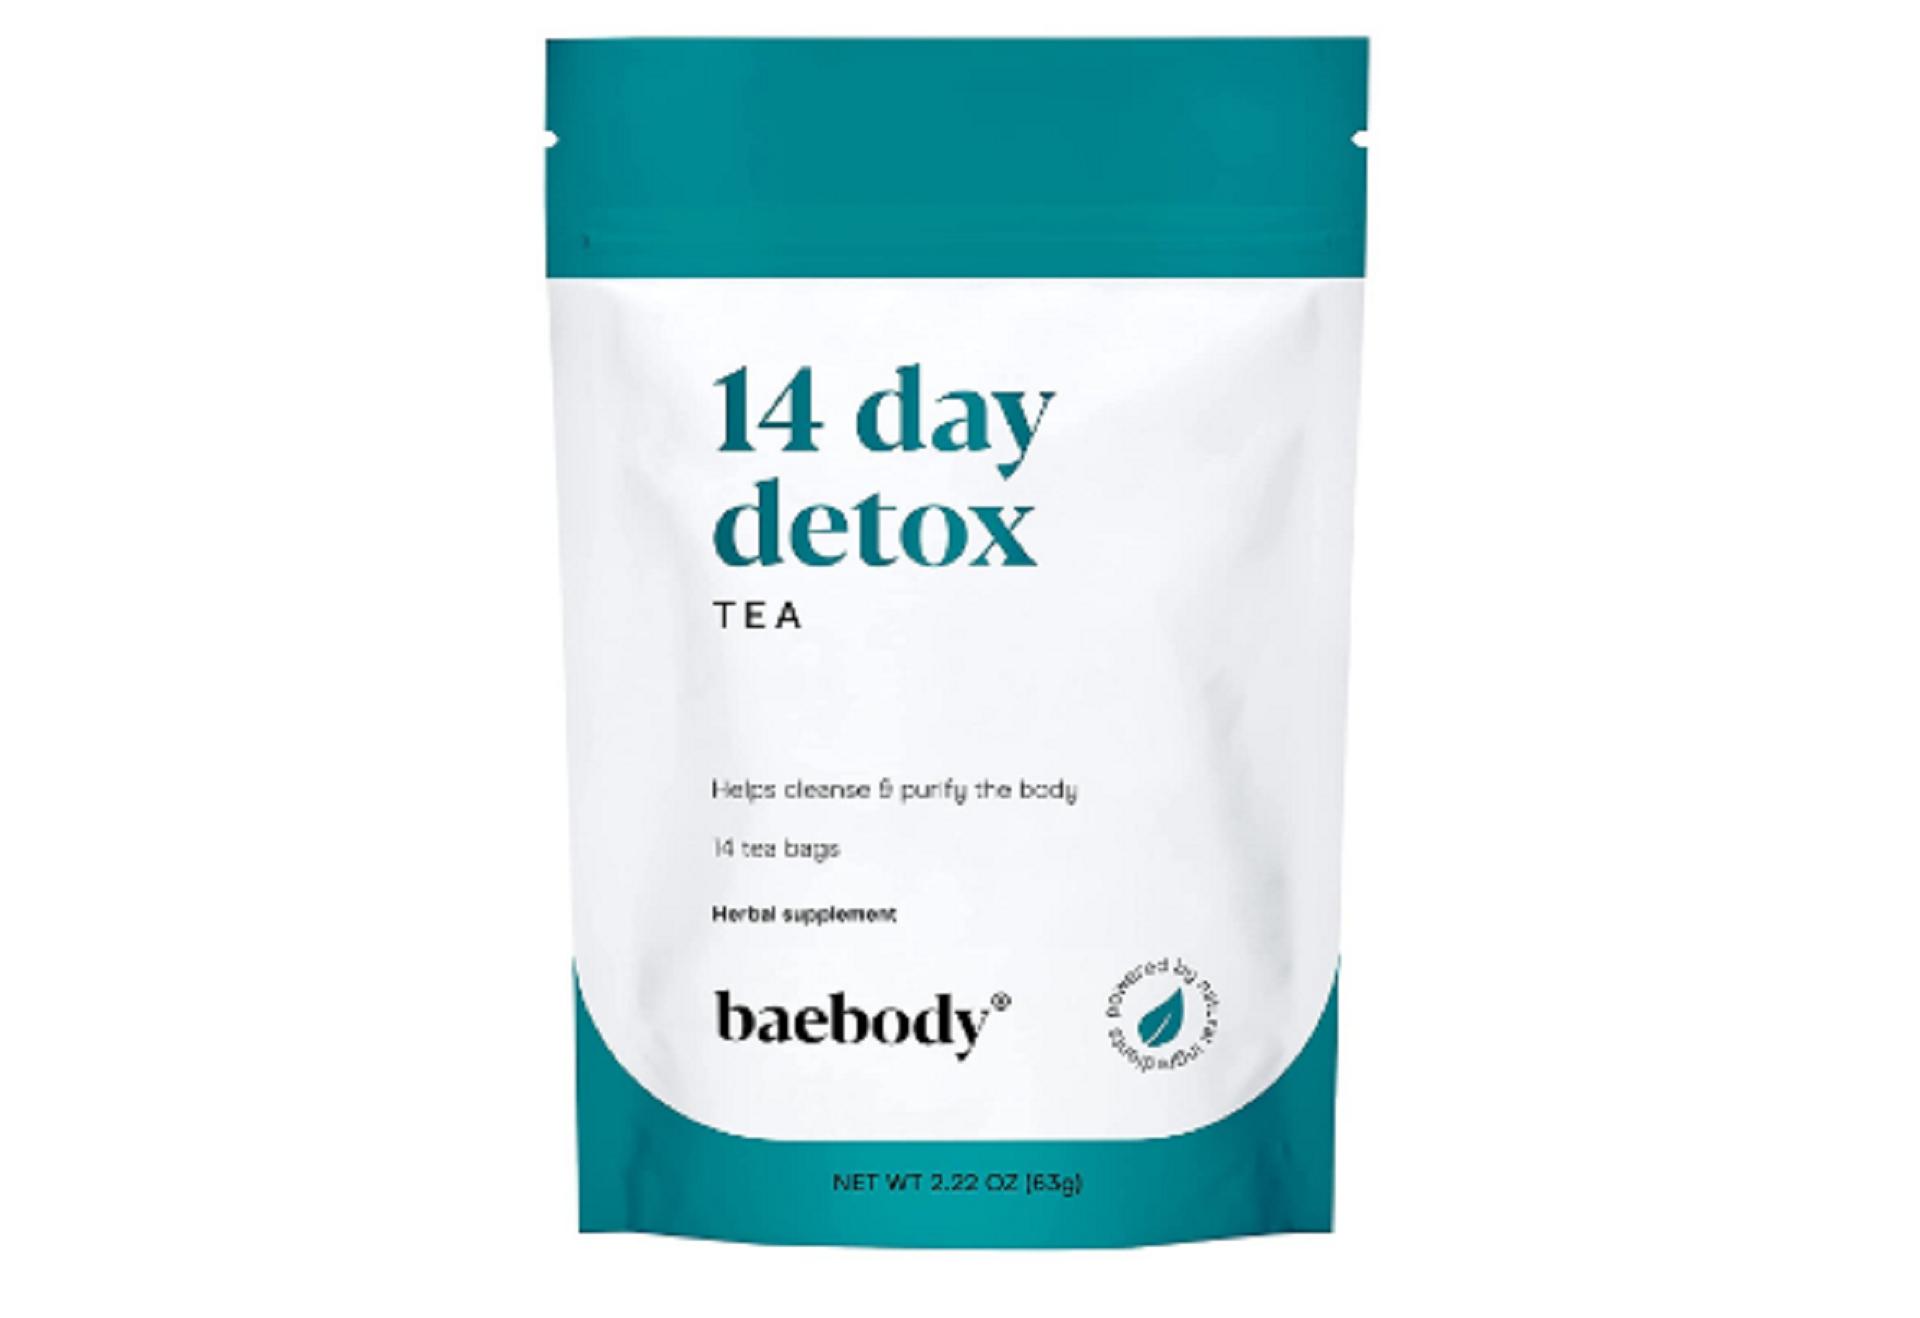 baetea 14-day teatox herbal detox tea